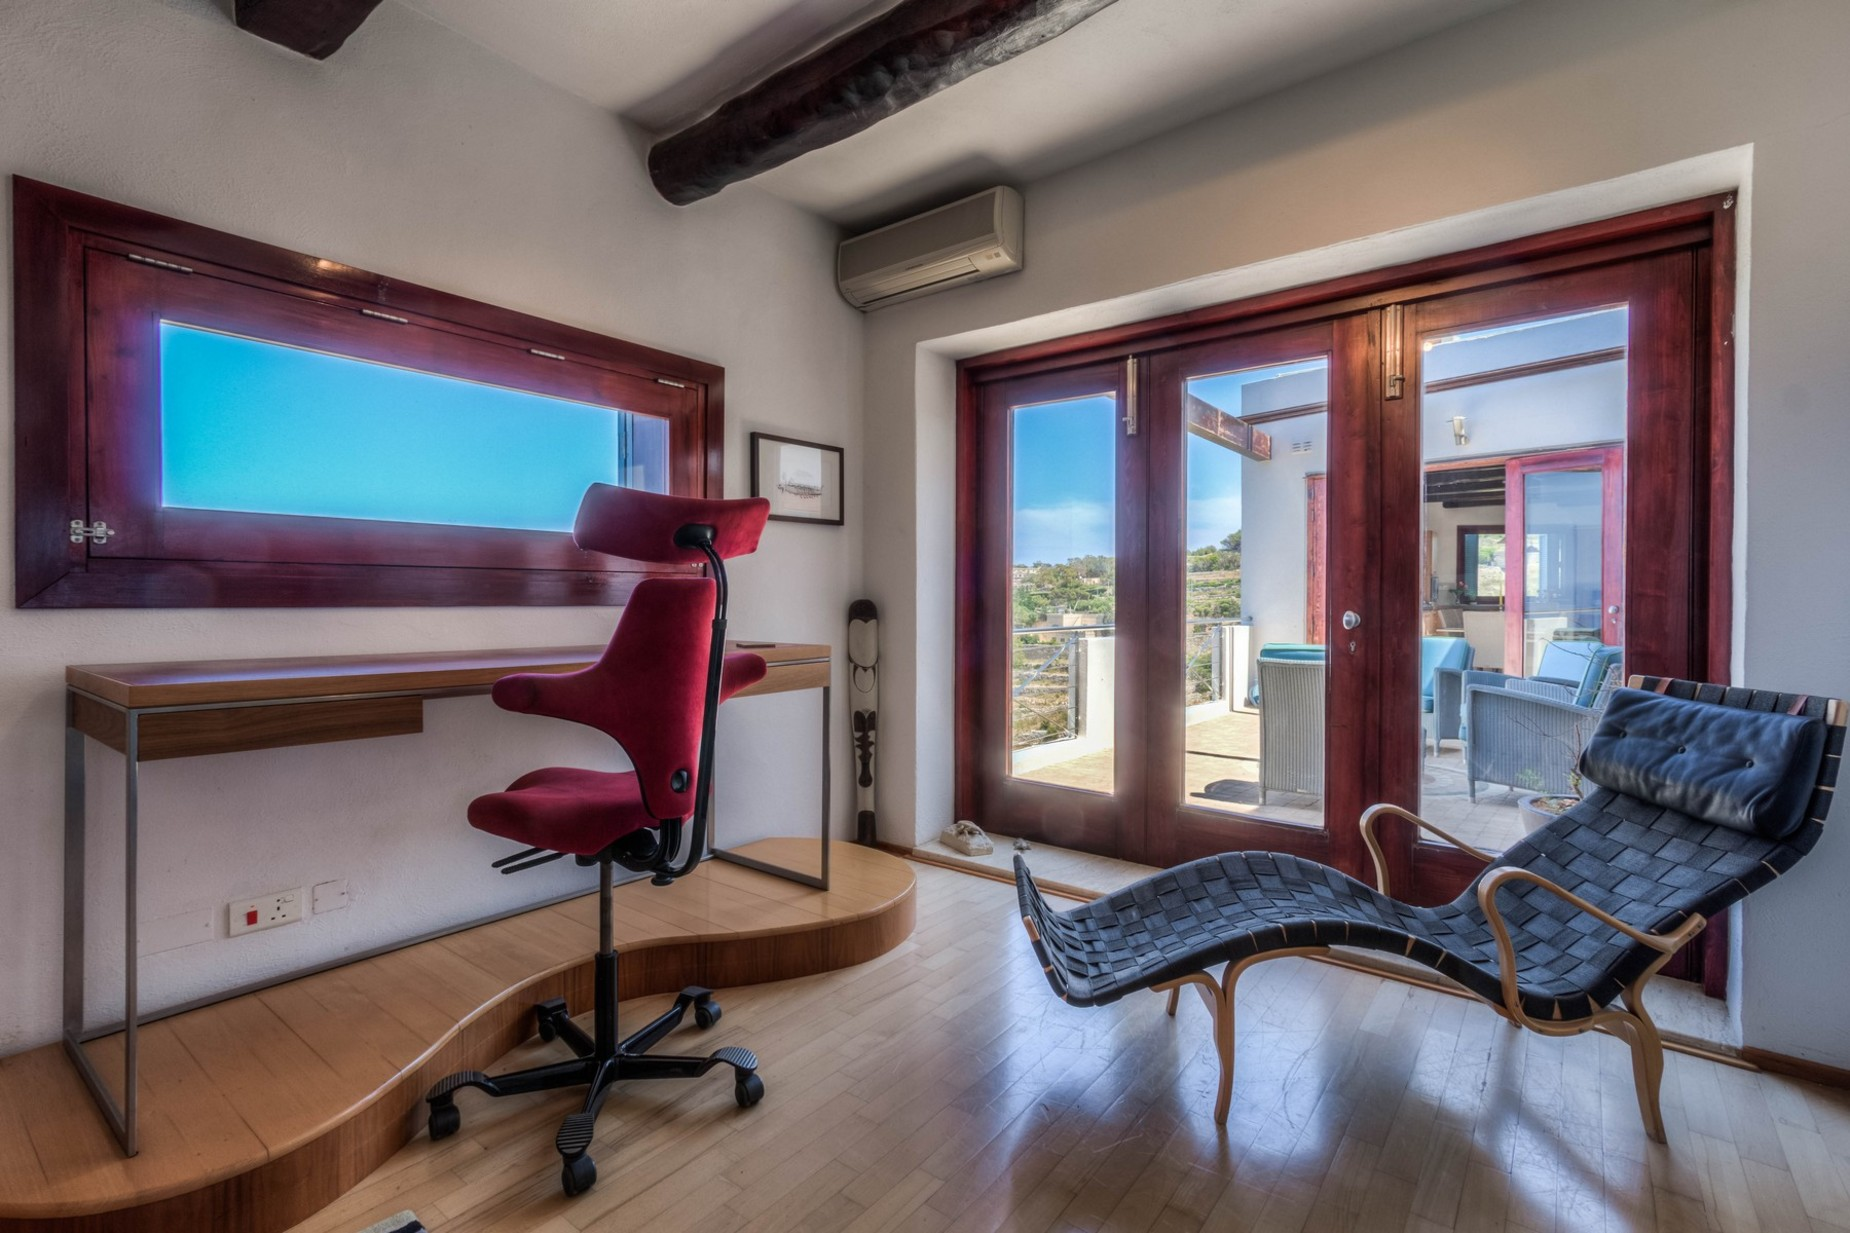 4 bed Villa For Sale in Gharghur, Gharghur - thumb 12